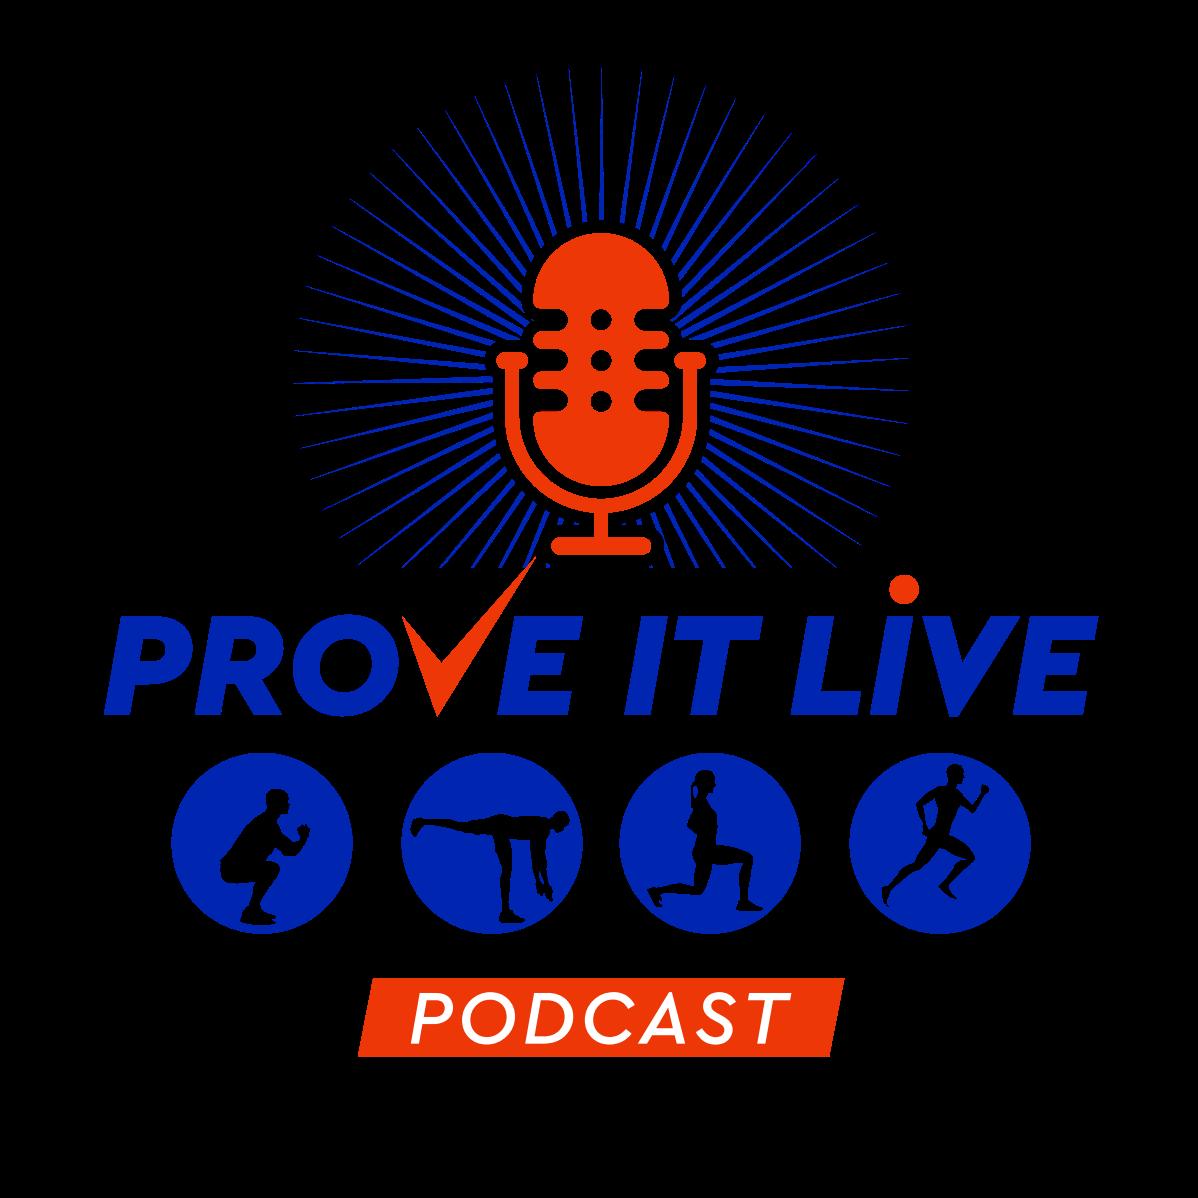 PROVE IT LIVE Podcast